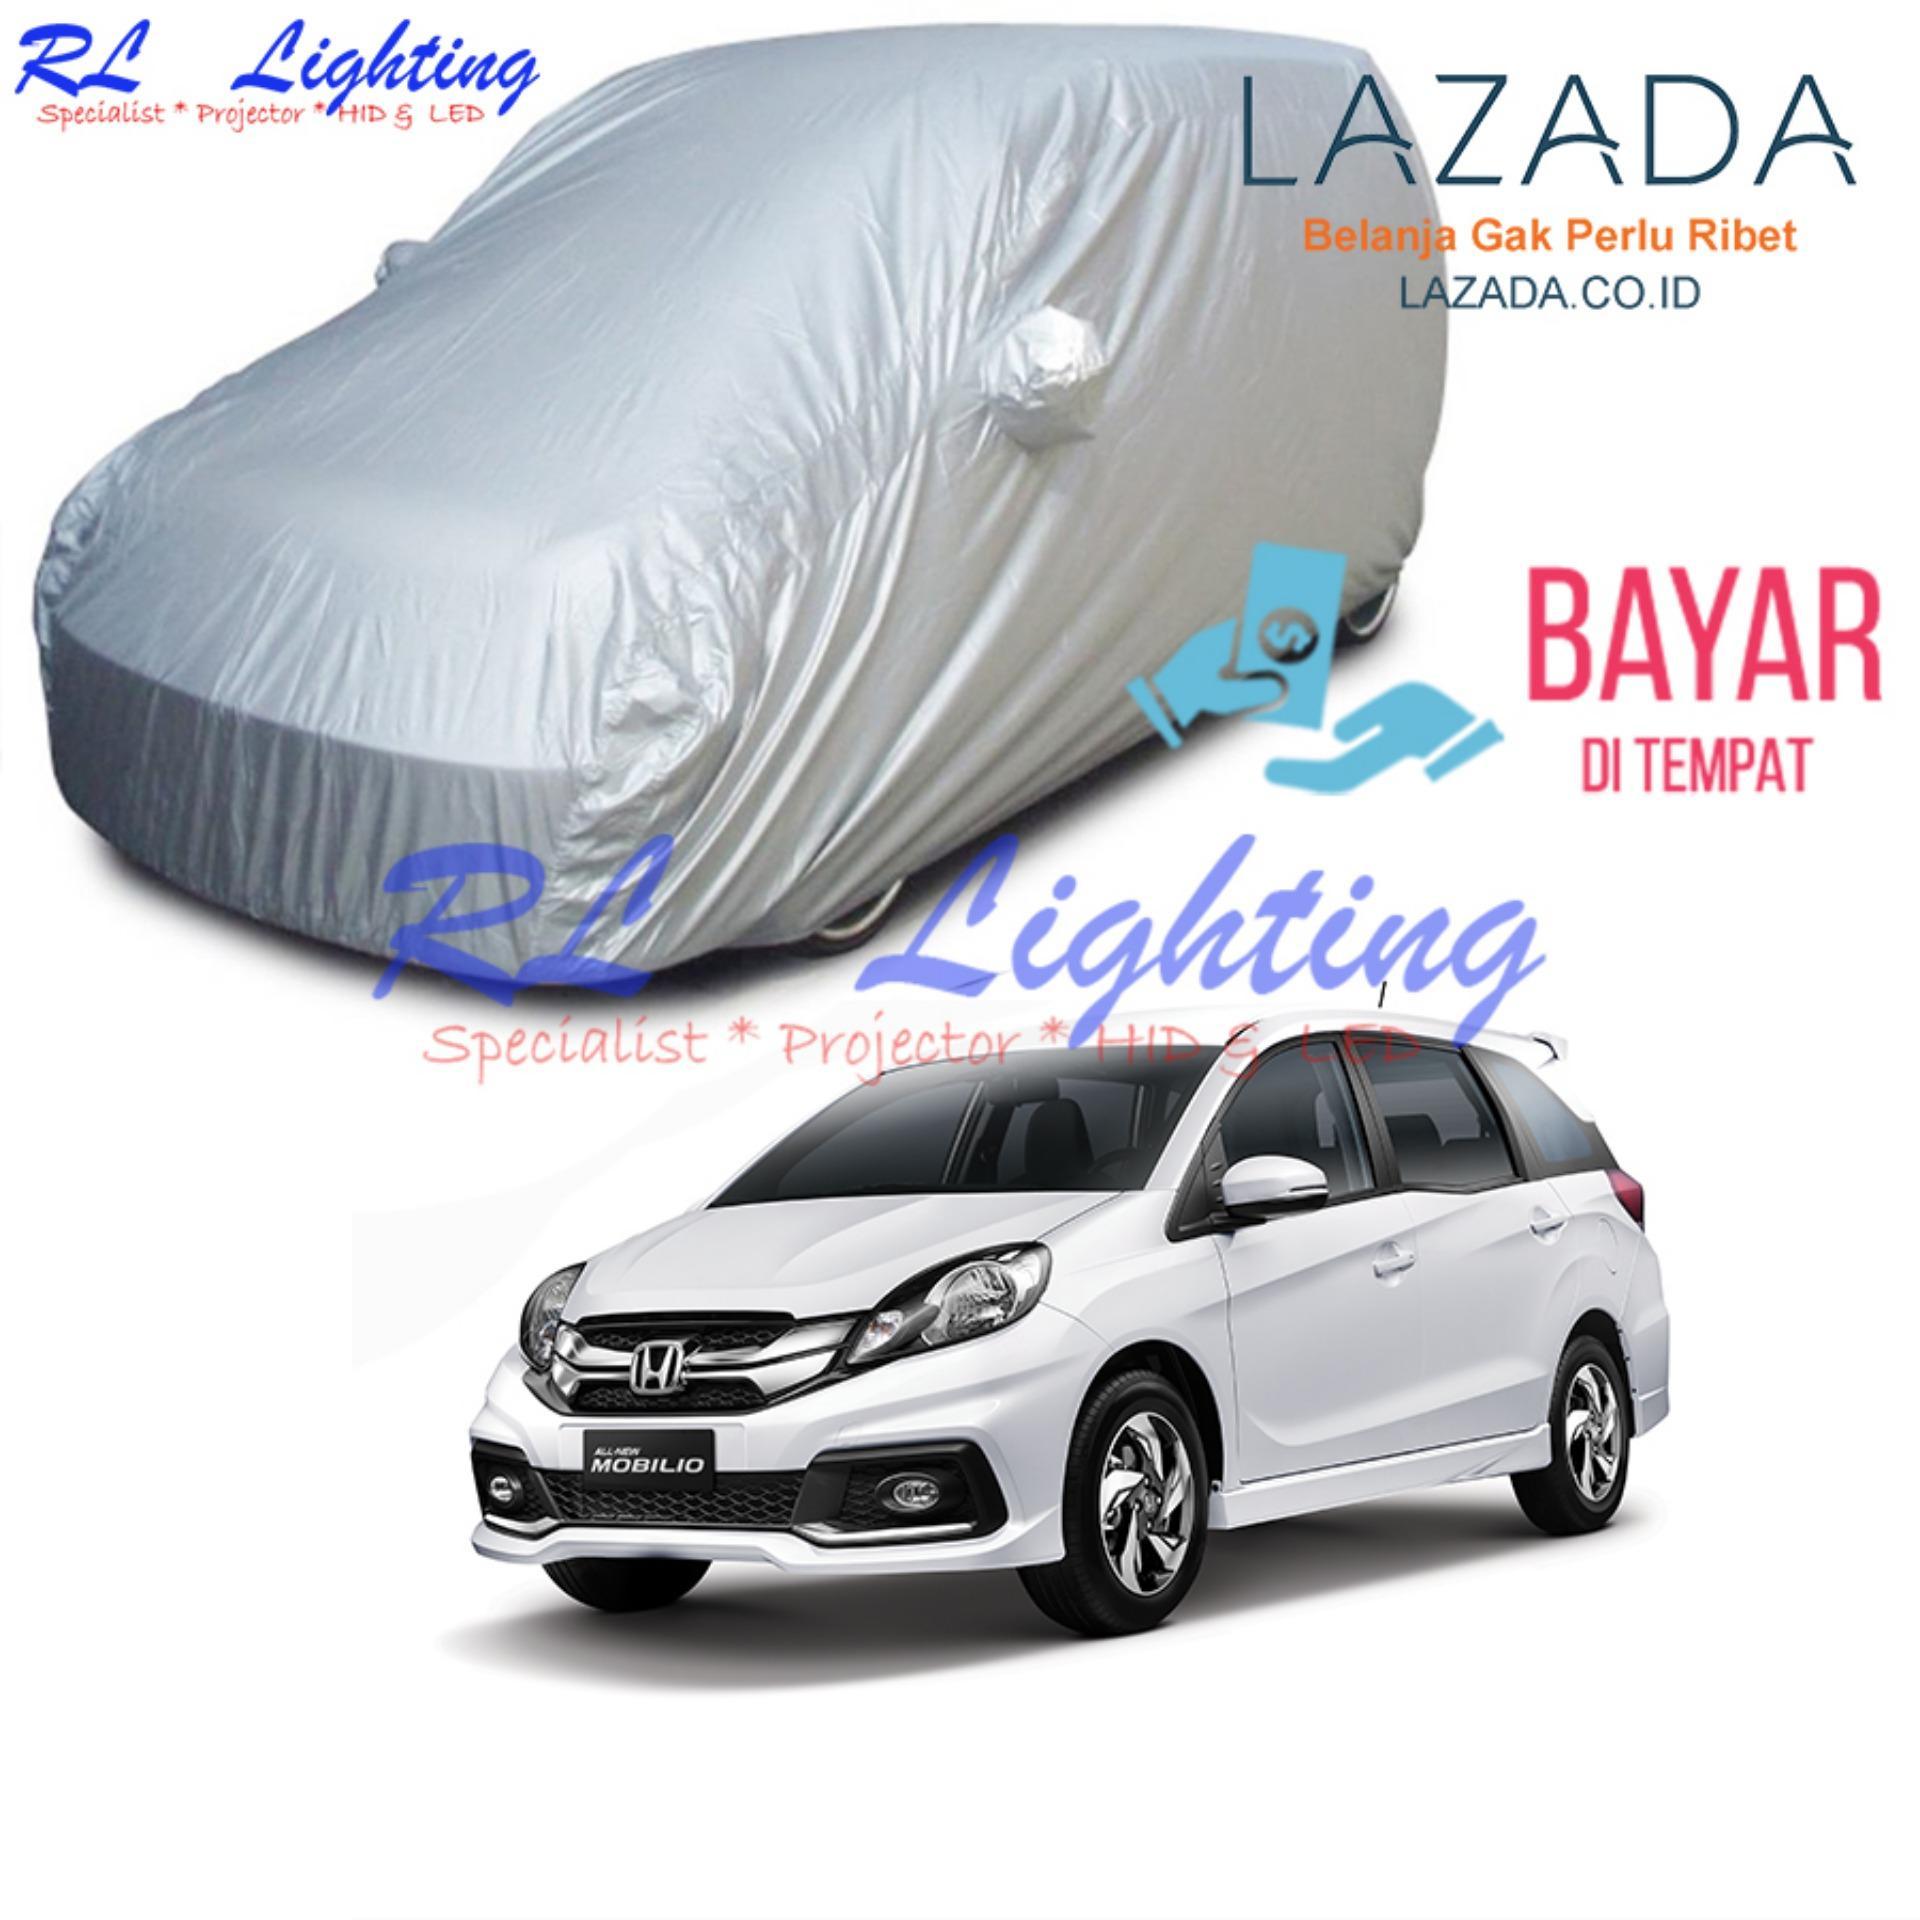 Autofriend Cover Spion Tanpa Lampu Honda Mobilio 2014 Garnish Pelindung Ai 3232 Hrv H Rv 2015 2016 On Foglamp Aksesoris Mobil Modifikasi